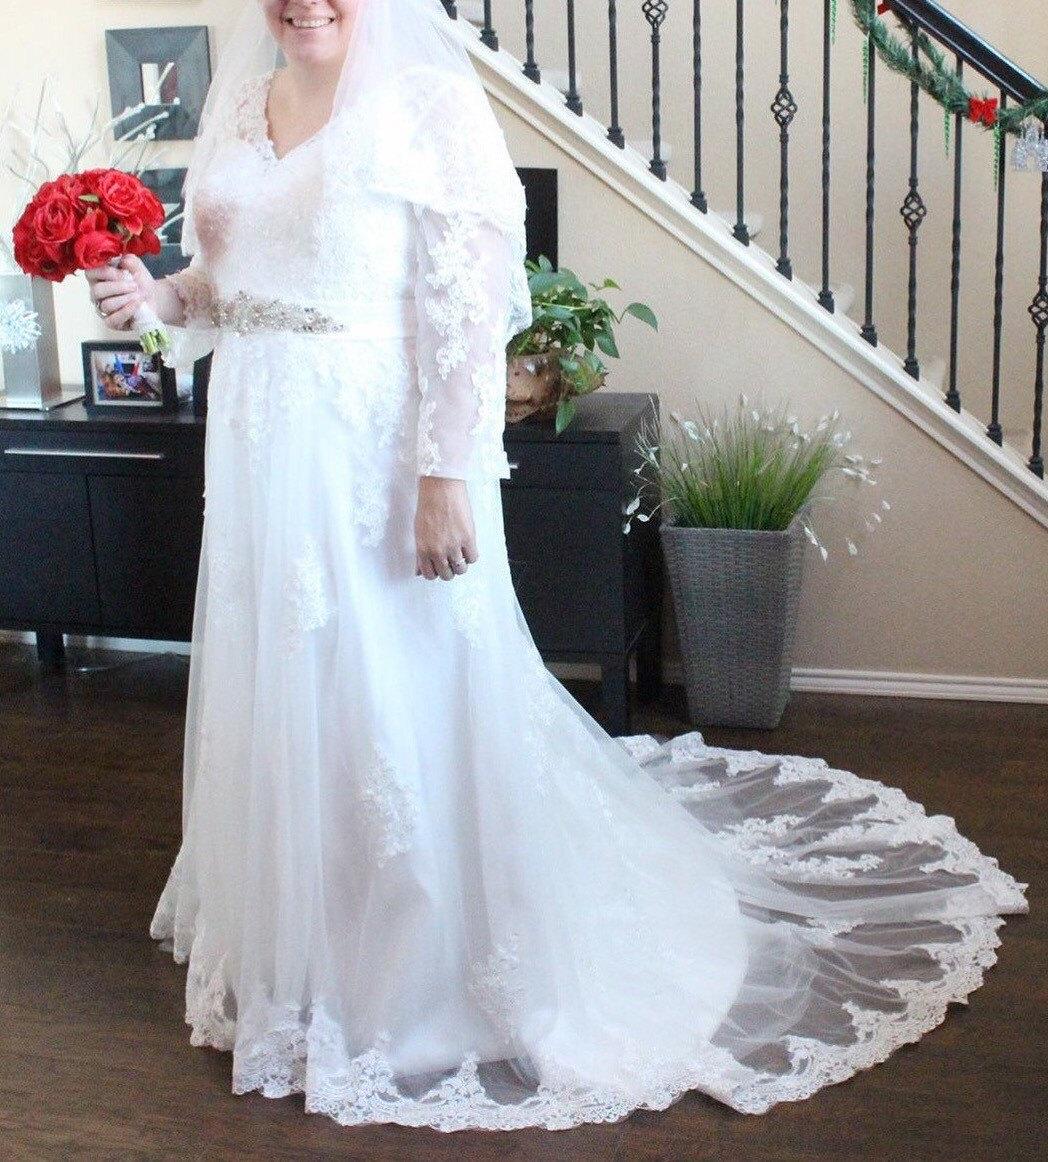 Full Figure Wedding Gowns: Full Figure Wedding Dress / Long Sleeve Wedding Dress / Beaded